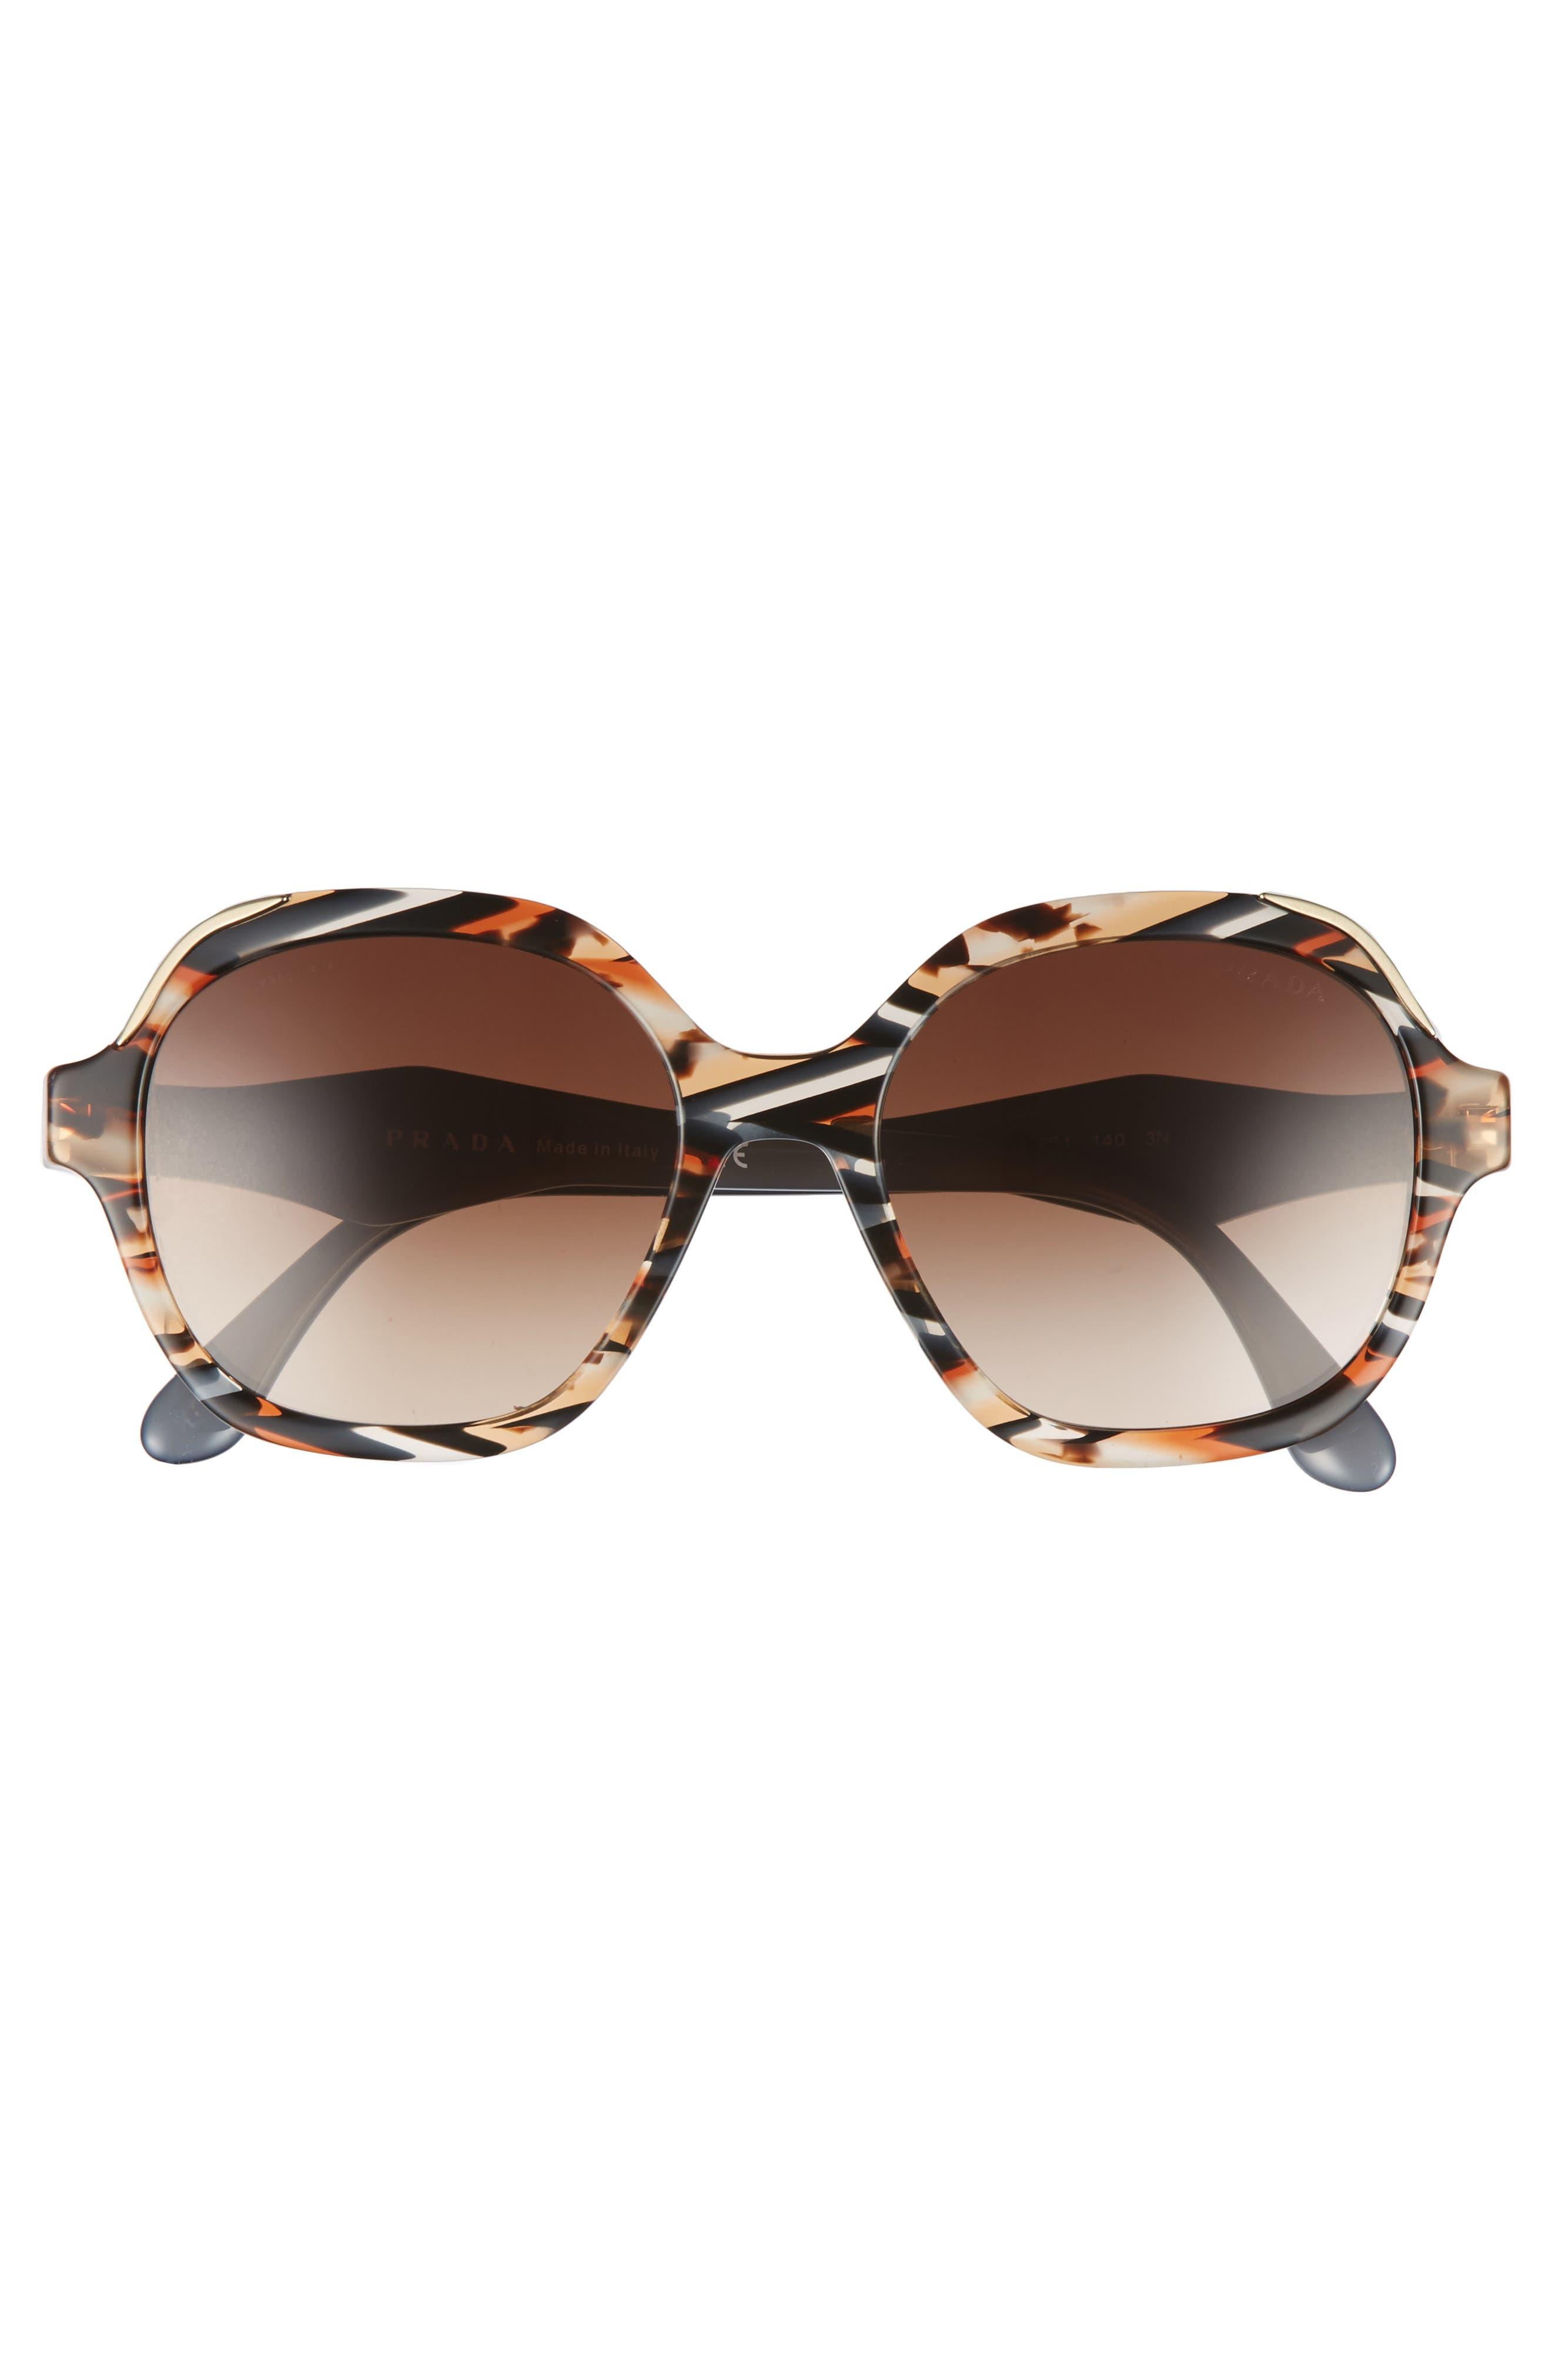 52mm Geometric Gradient Sunglasses,                             Alternate thumbnail 8, color,